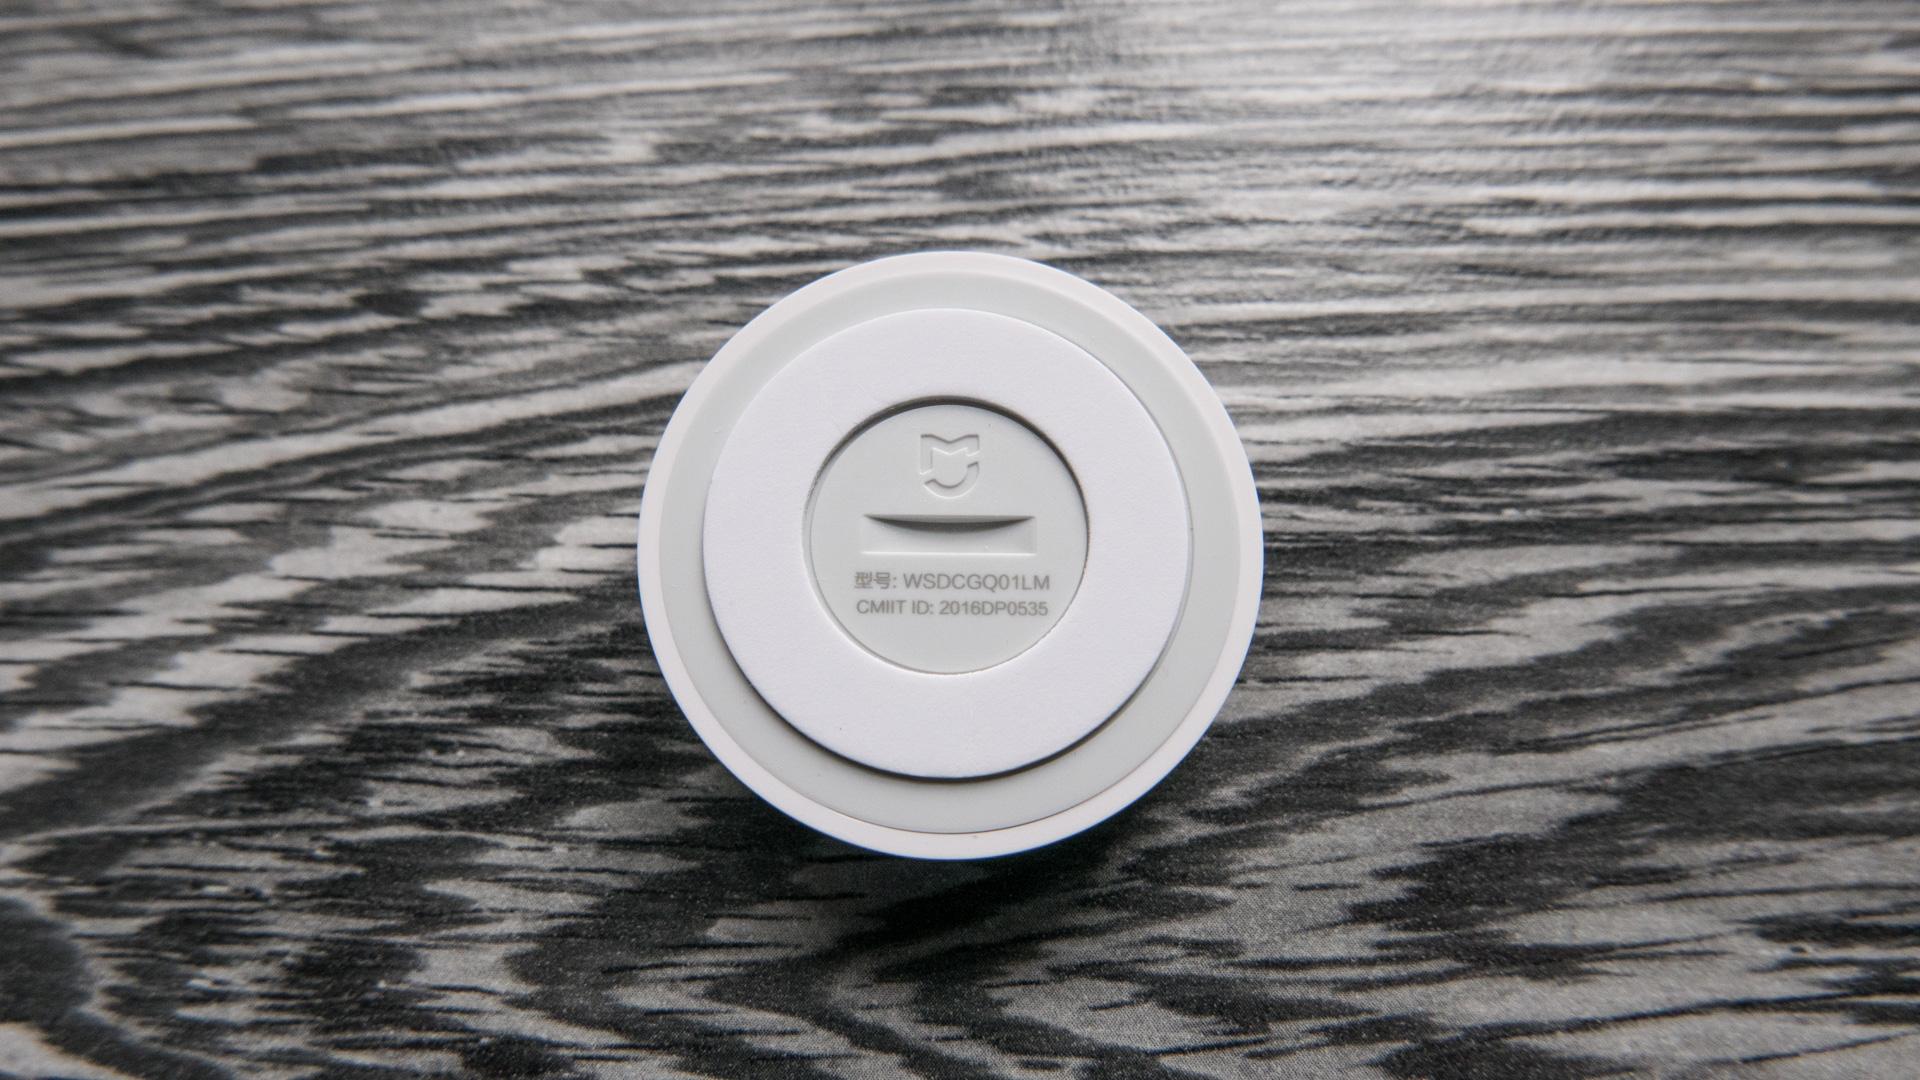 Xiaomi Mi Home Temperatursensor 05